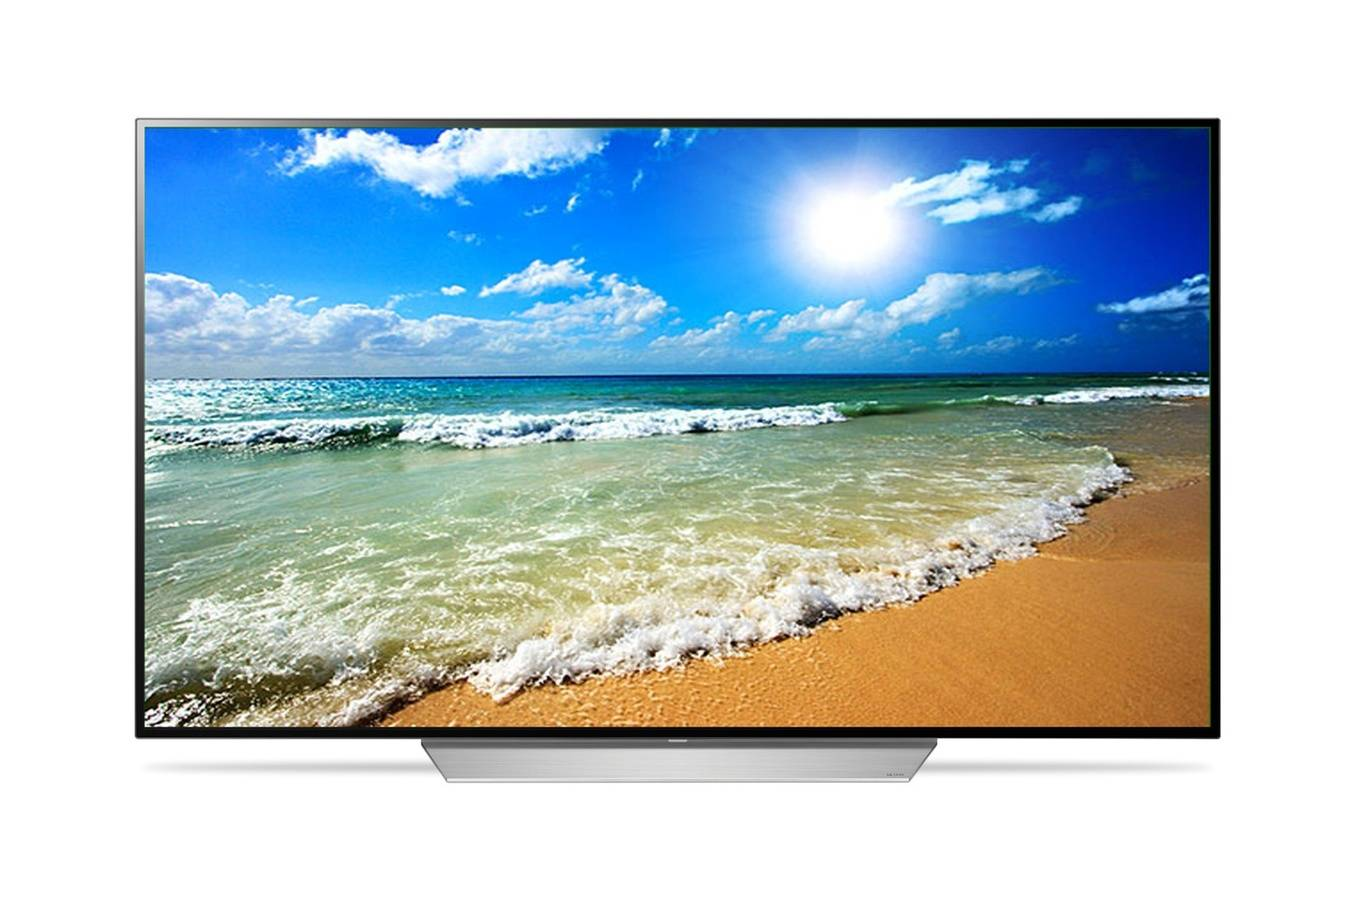 La calidad de la imagen del televisor es superior a la del ojo humano